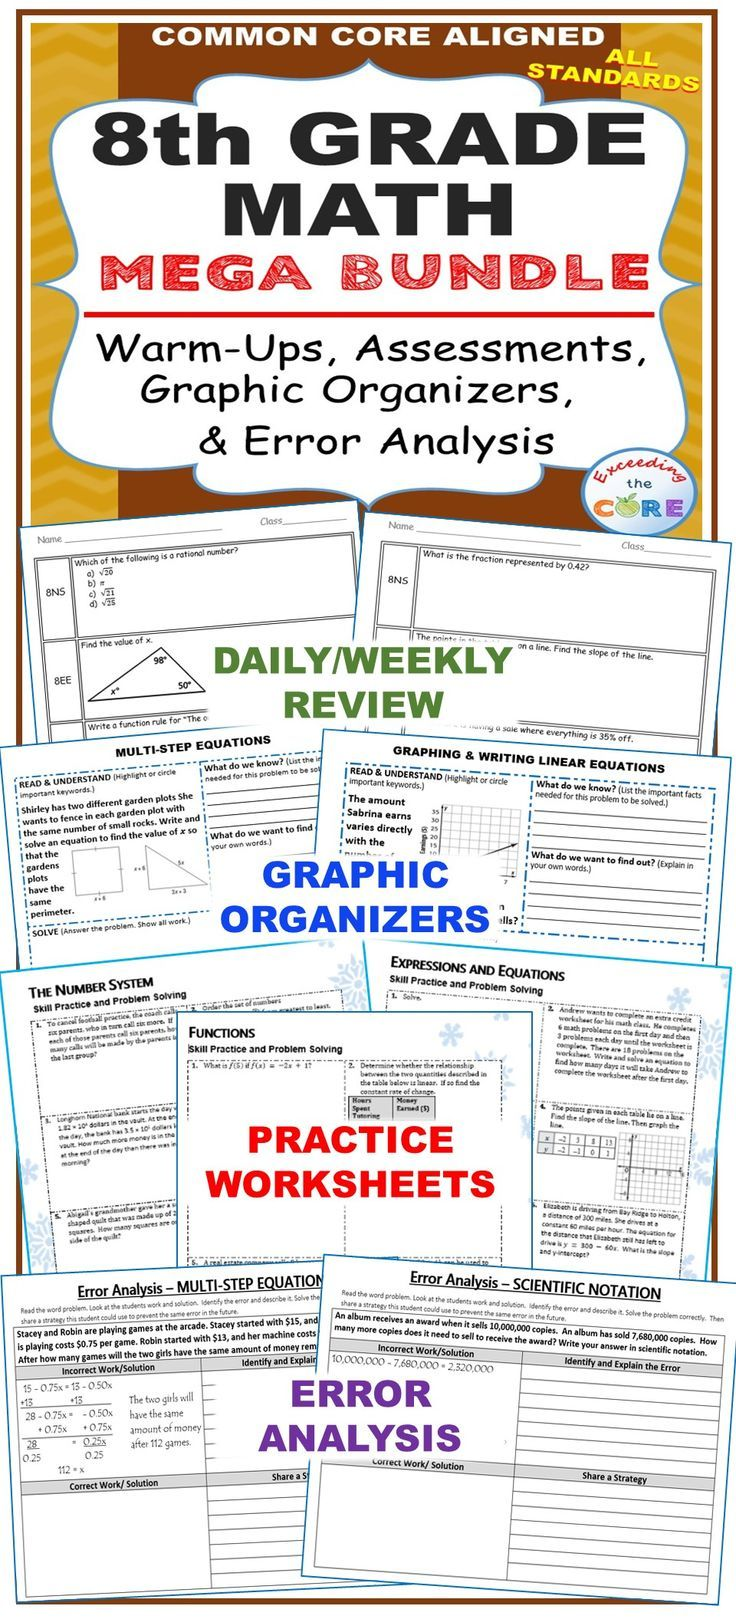 8th Grade Math Common Core Assessments Warm Ups Task Cards Worksheets 8th Grade Math Common Core Assessments Error Analysis [ 1619 x 736 Pixel ]